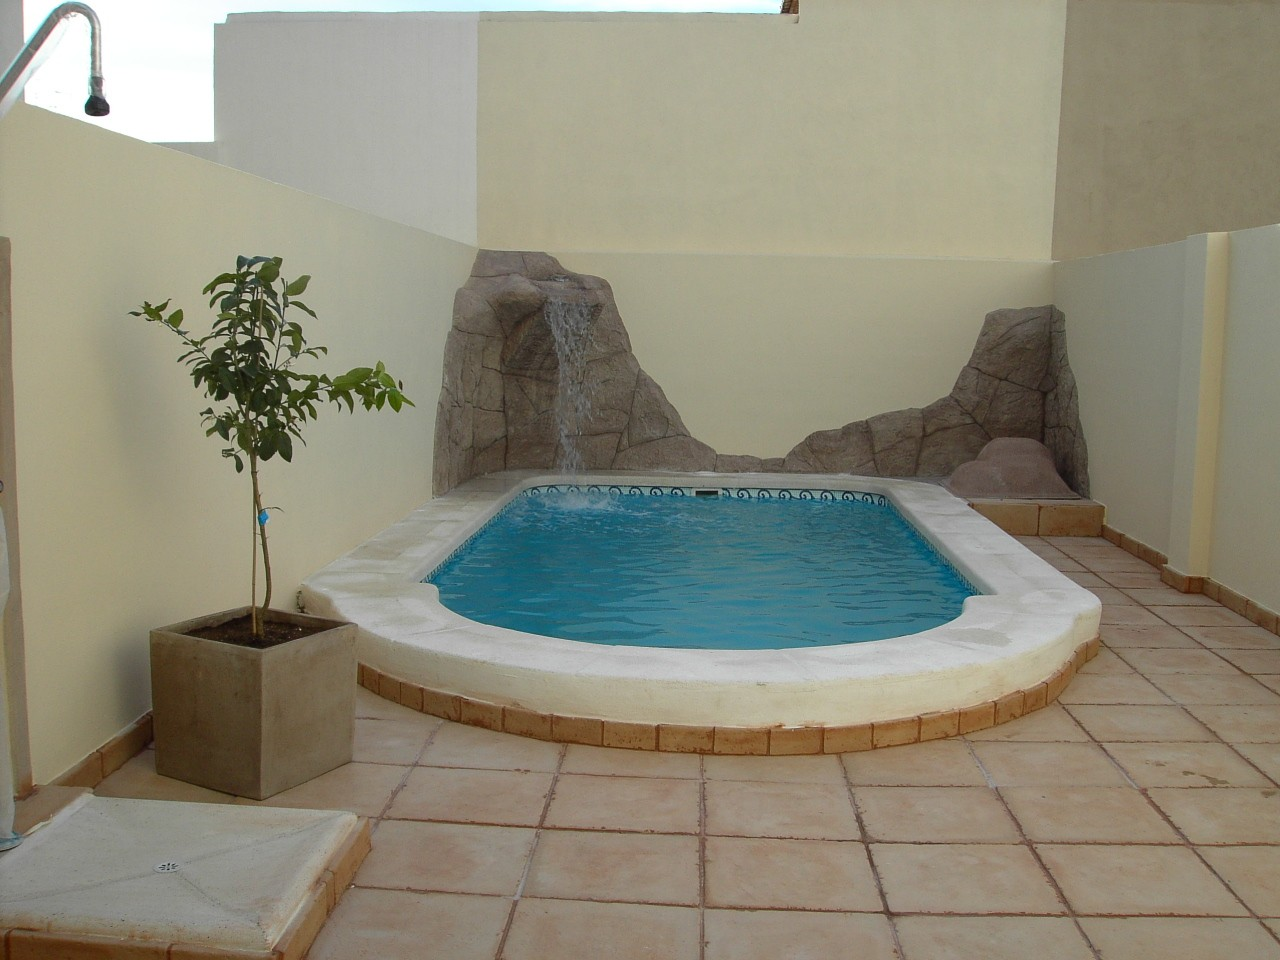 Piscina modelo c 61 codetrac s l expertos en piscinas for Piscinas muy pequenas